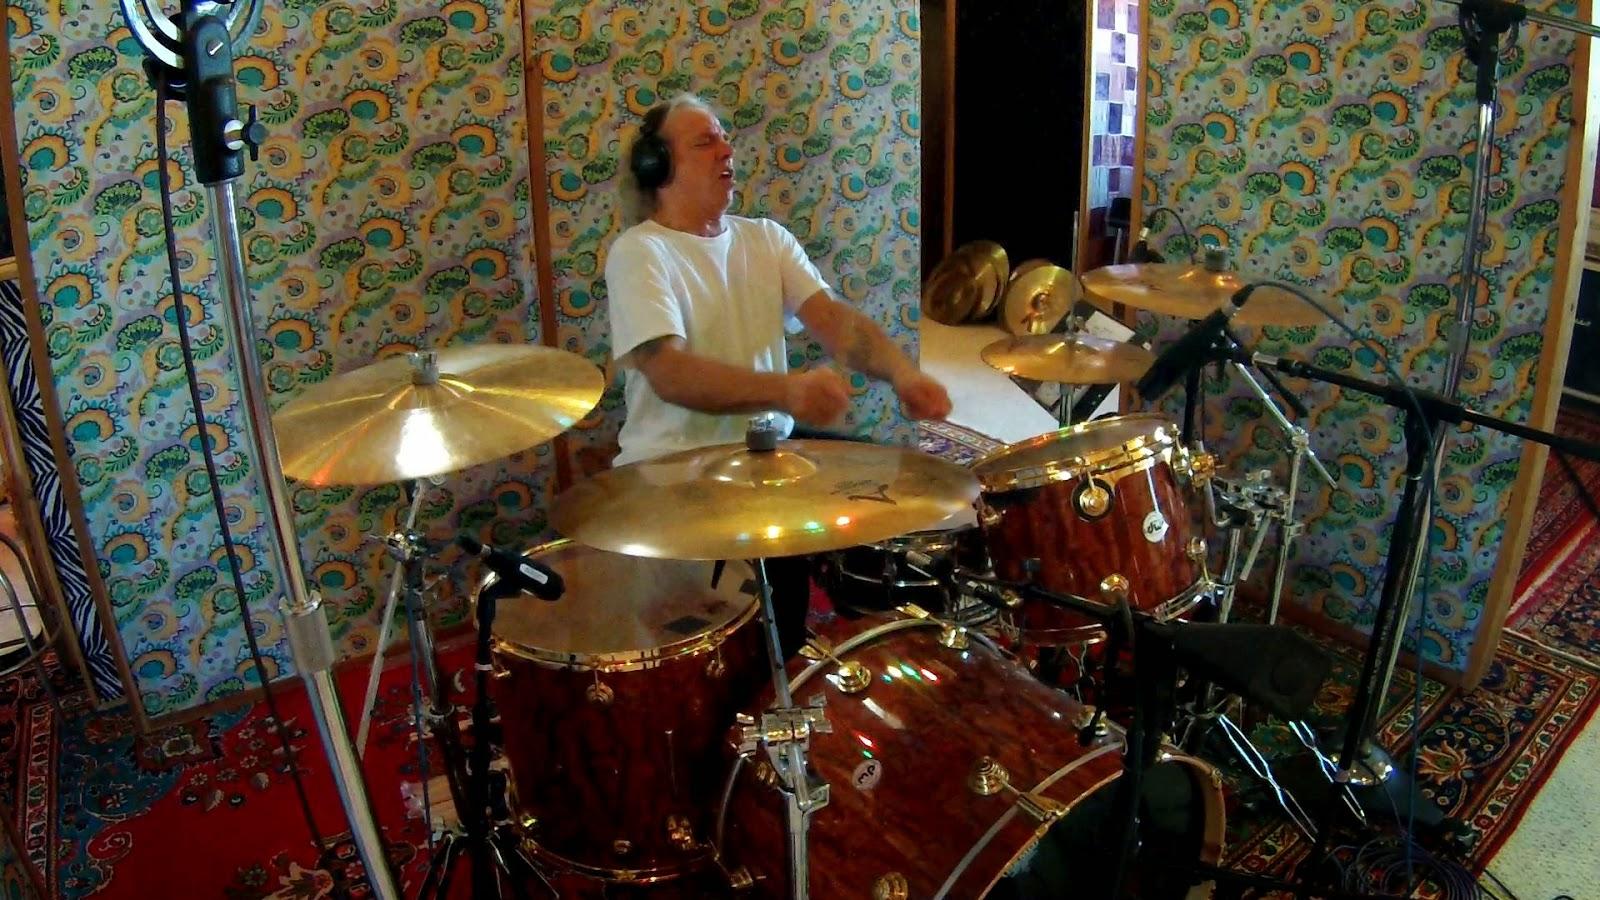 christopher long show biz guru glenn evans nuclear assault 39 s pot head drums up new solo album. Black Bedroom Furniture Sets. Home Design Ideas